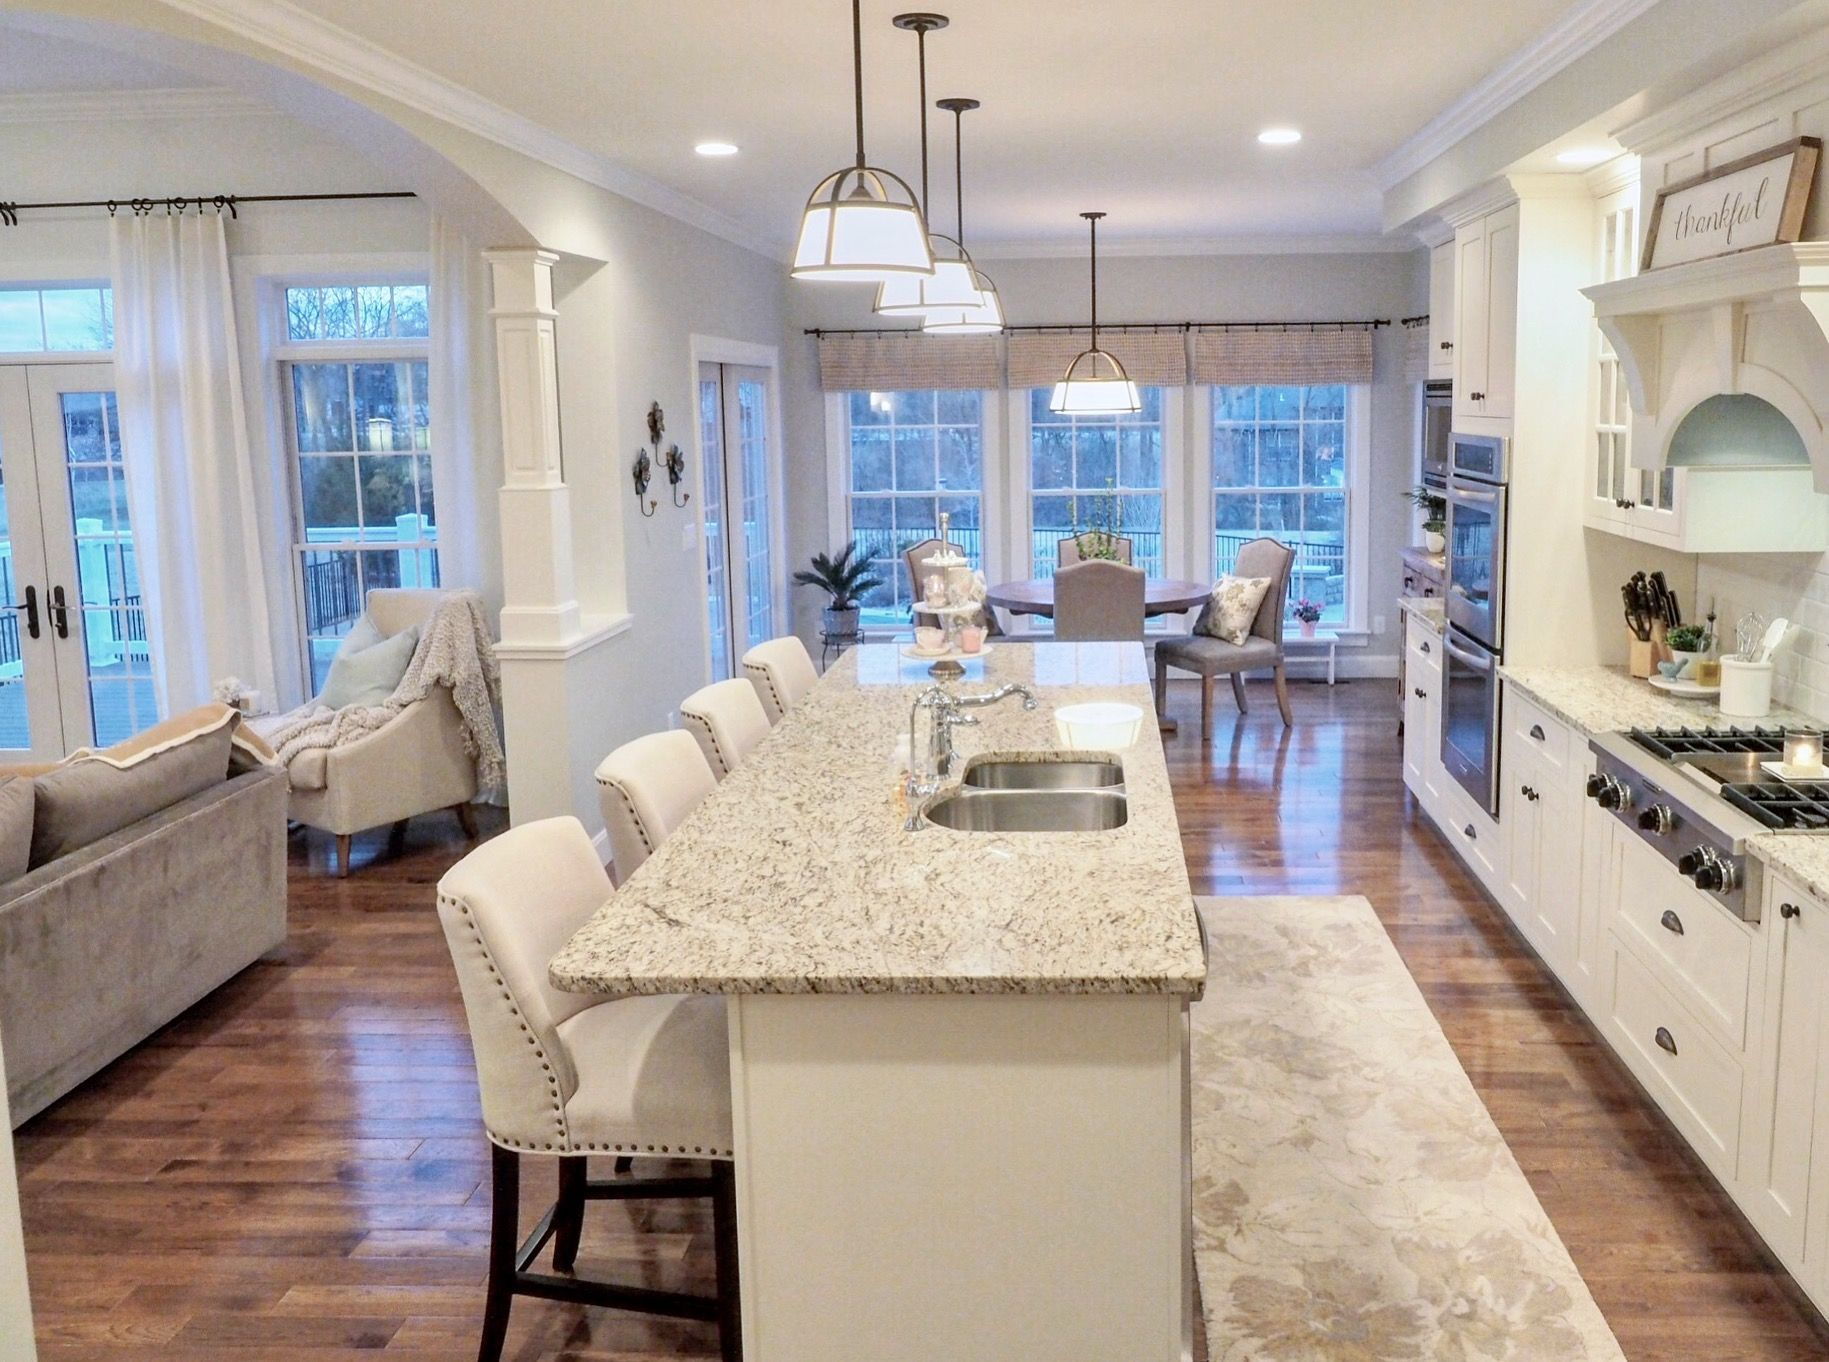 Kitchen Off White Cabinets